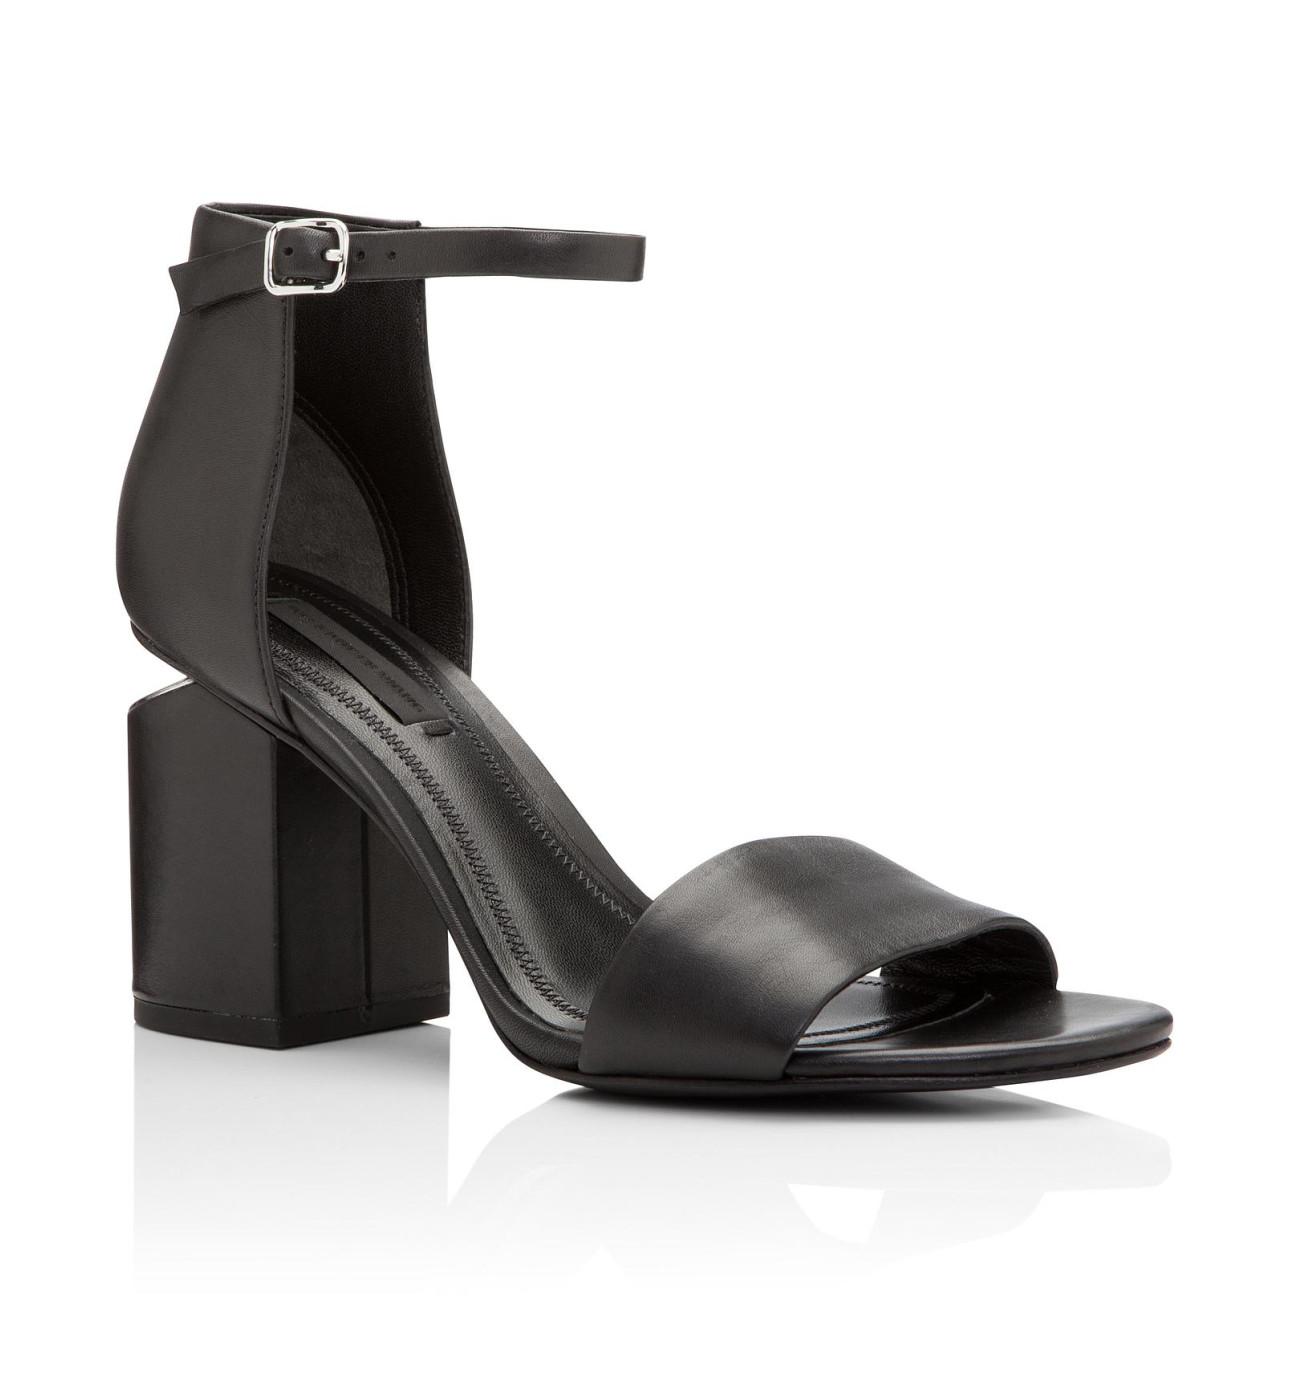 Women's sandals big w - Abby Sandal